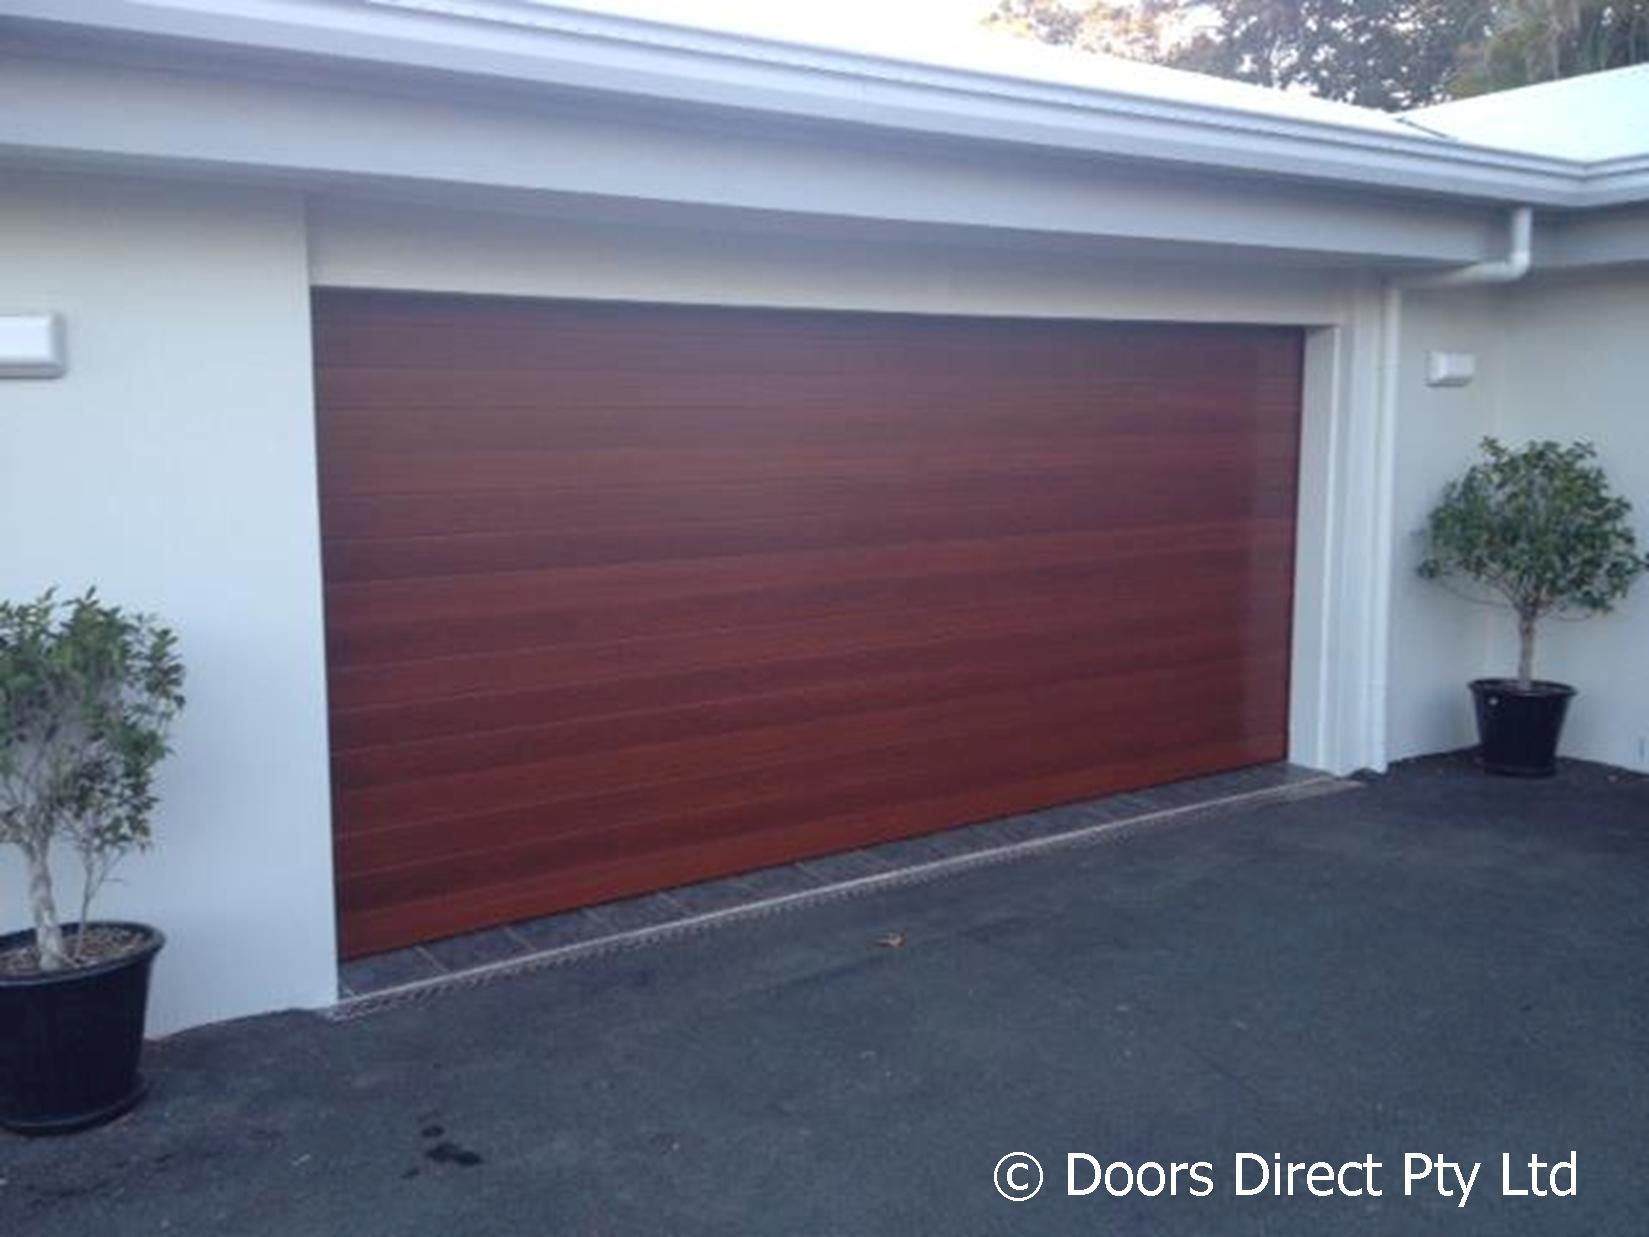 1237 #41628A Seville Sectional Timber Coat Jarrah Colour pic Residential Garage Doors Direct 38211649